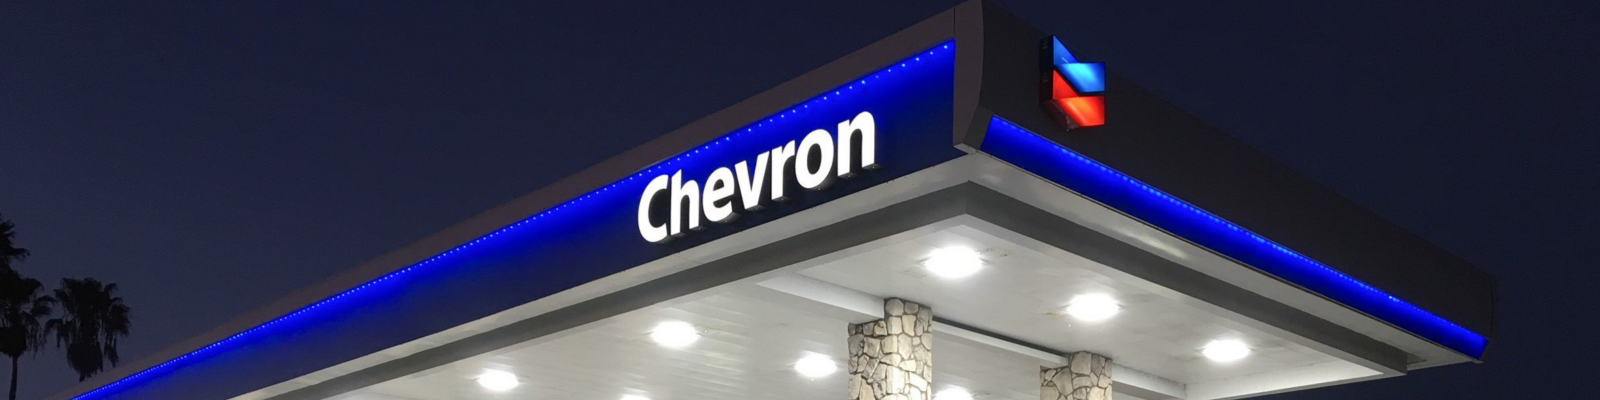 Chevron gas station branding